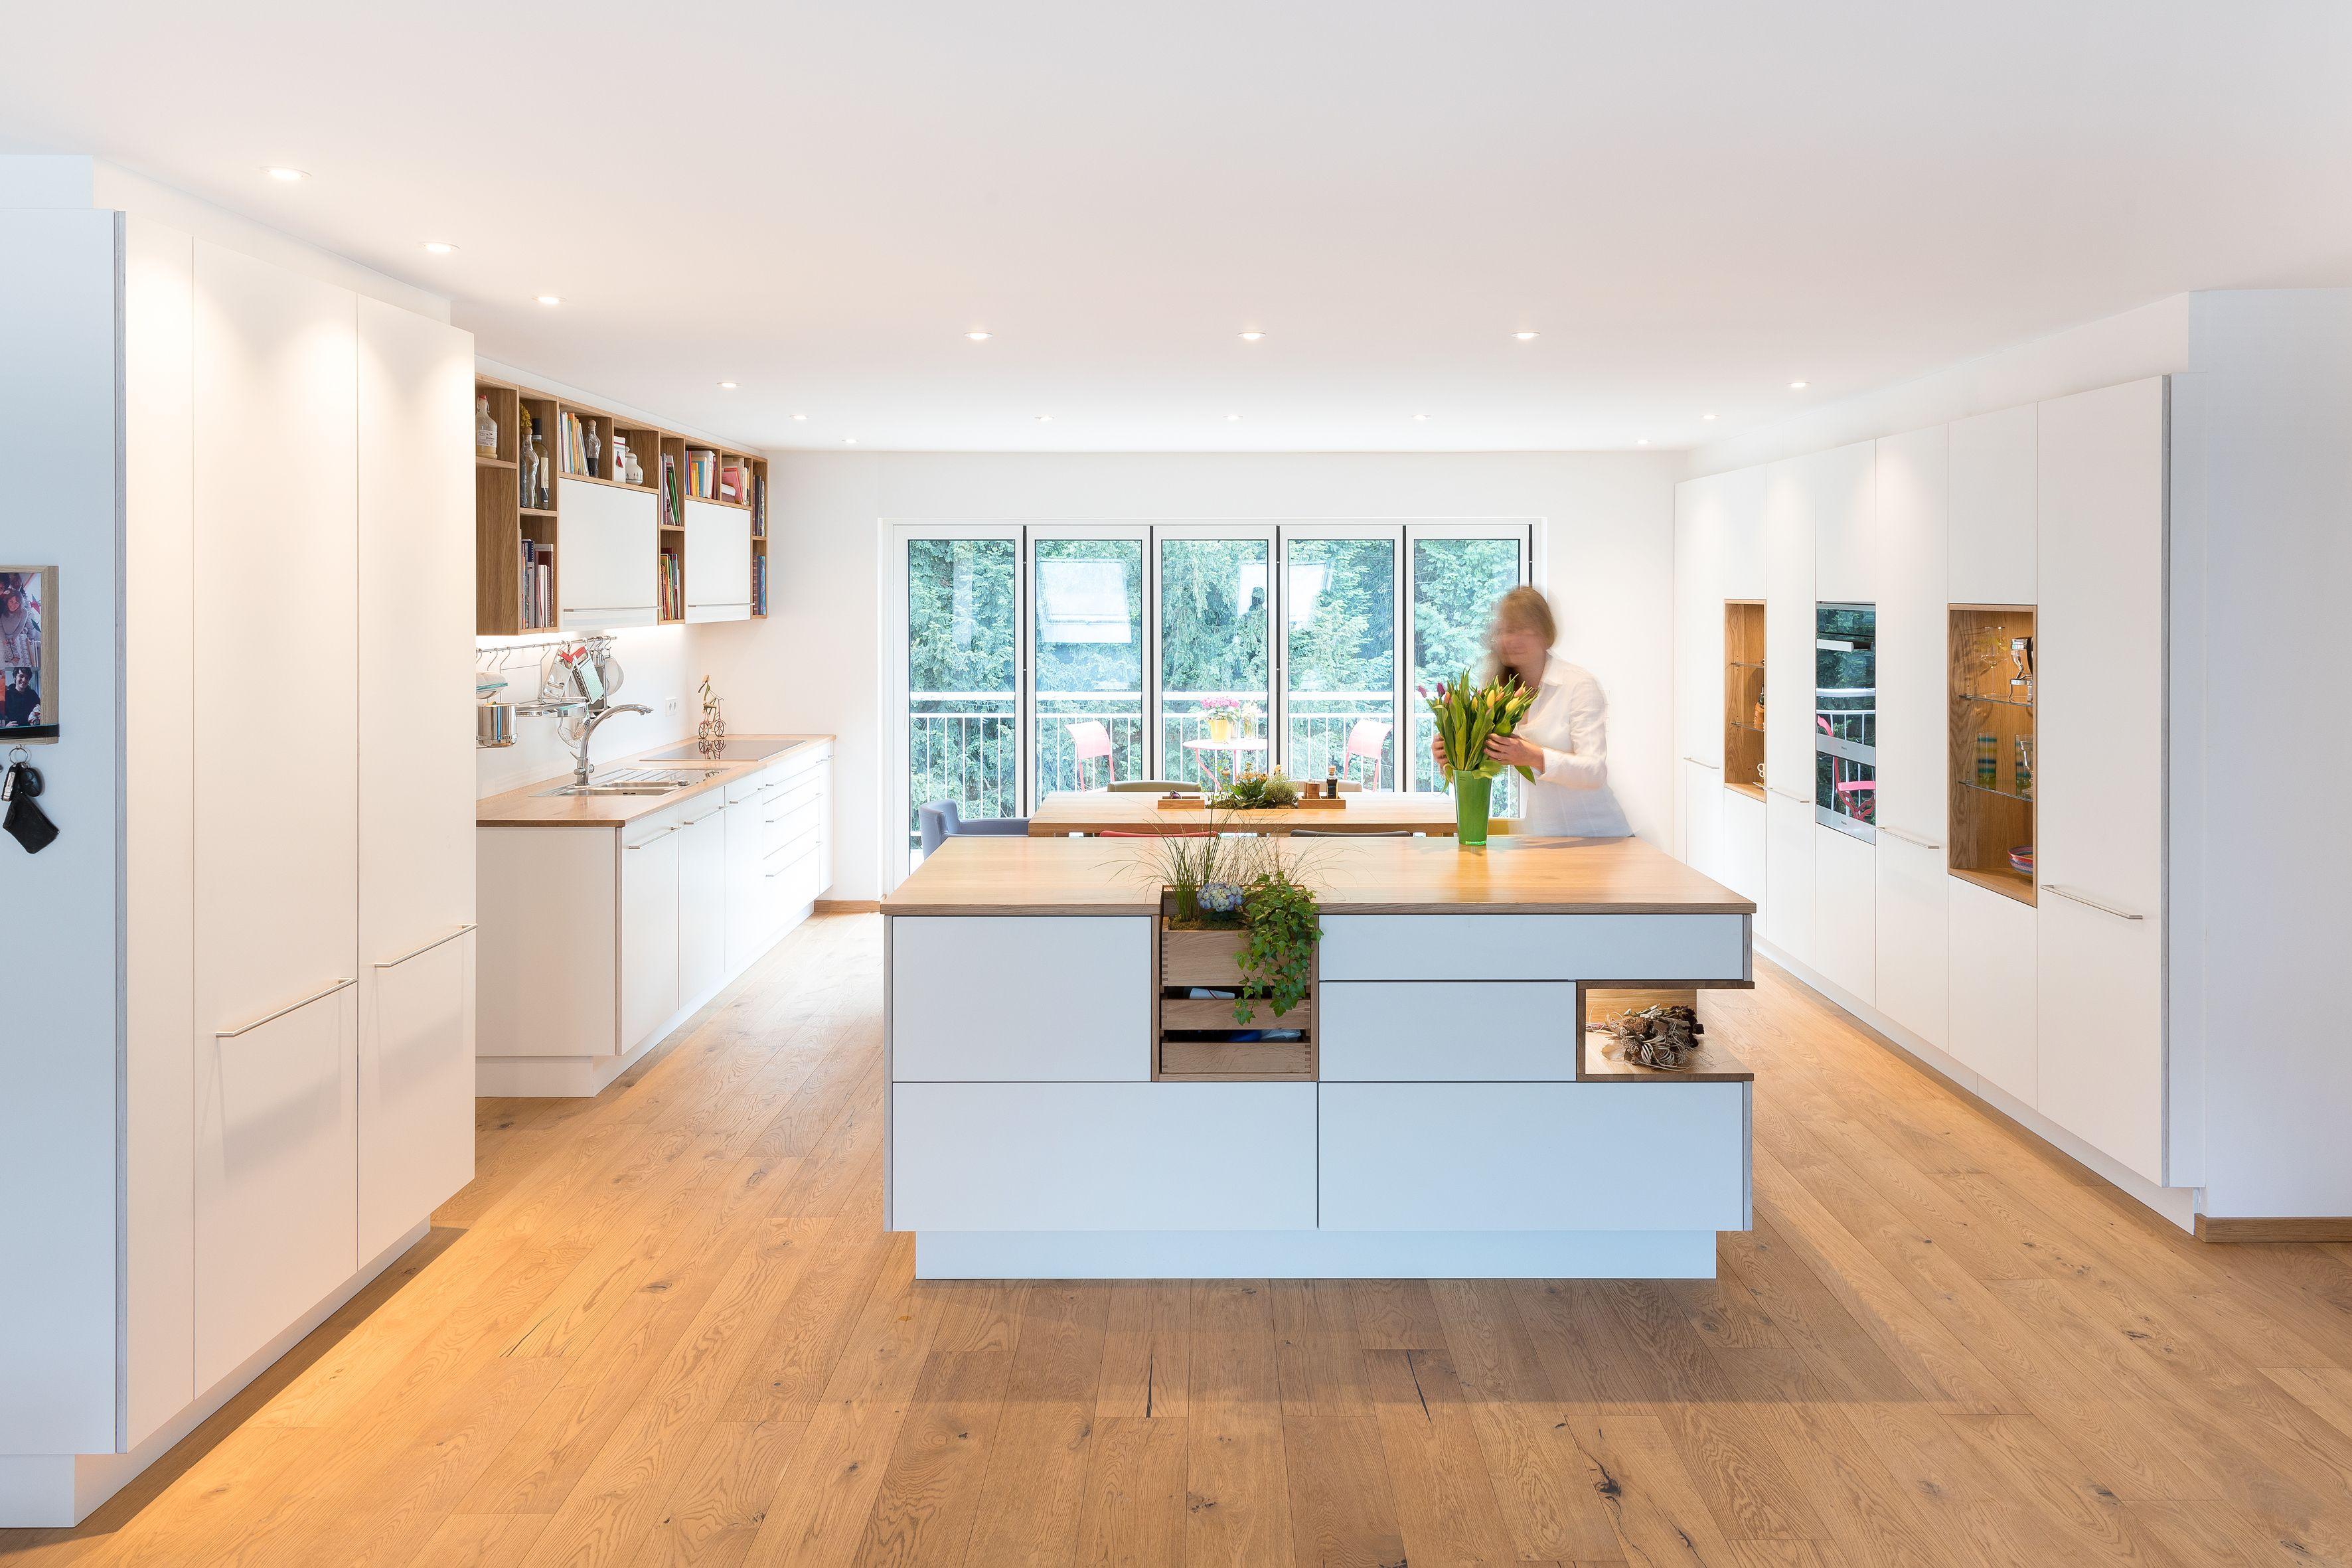 k che k che planen k chenplanung wei modern gro hell gro familie ger umig. Black Bedroom Furniture Sets. Home Design Ideas